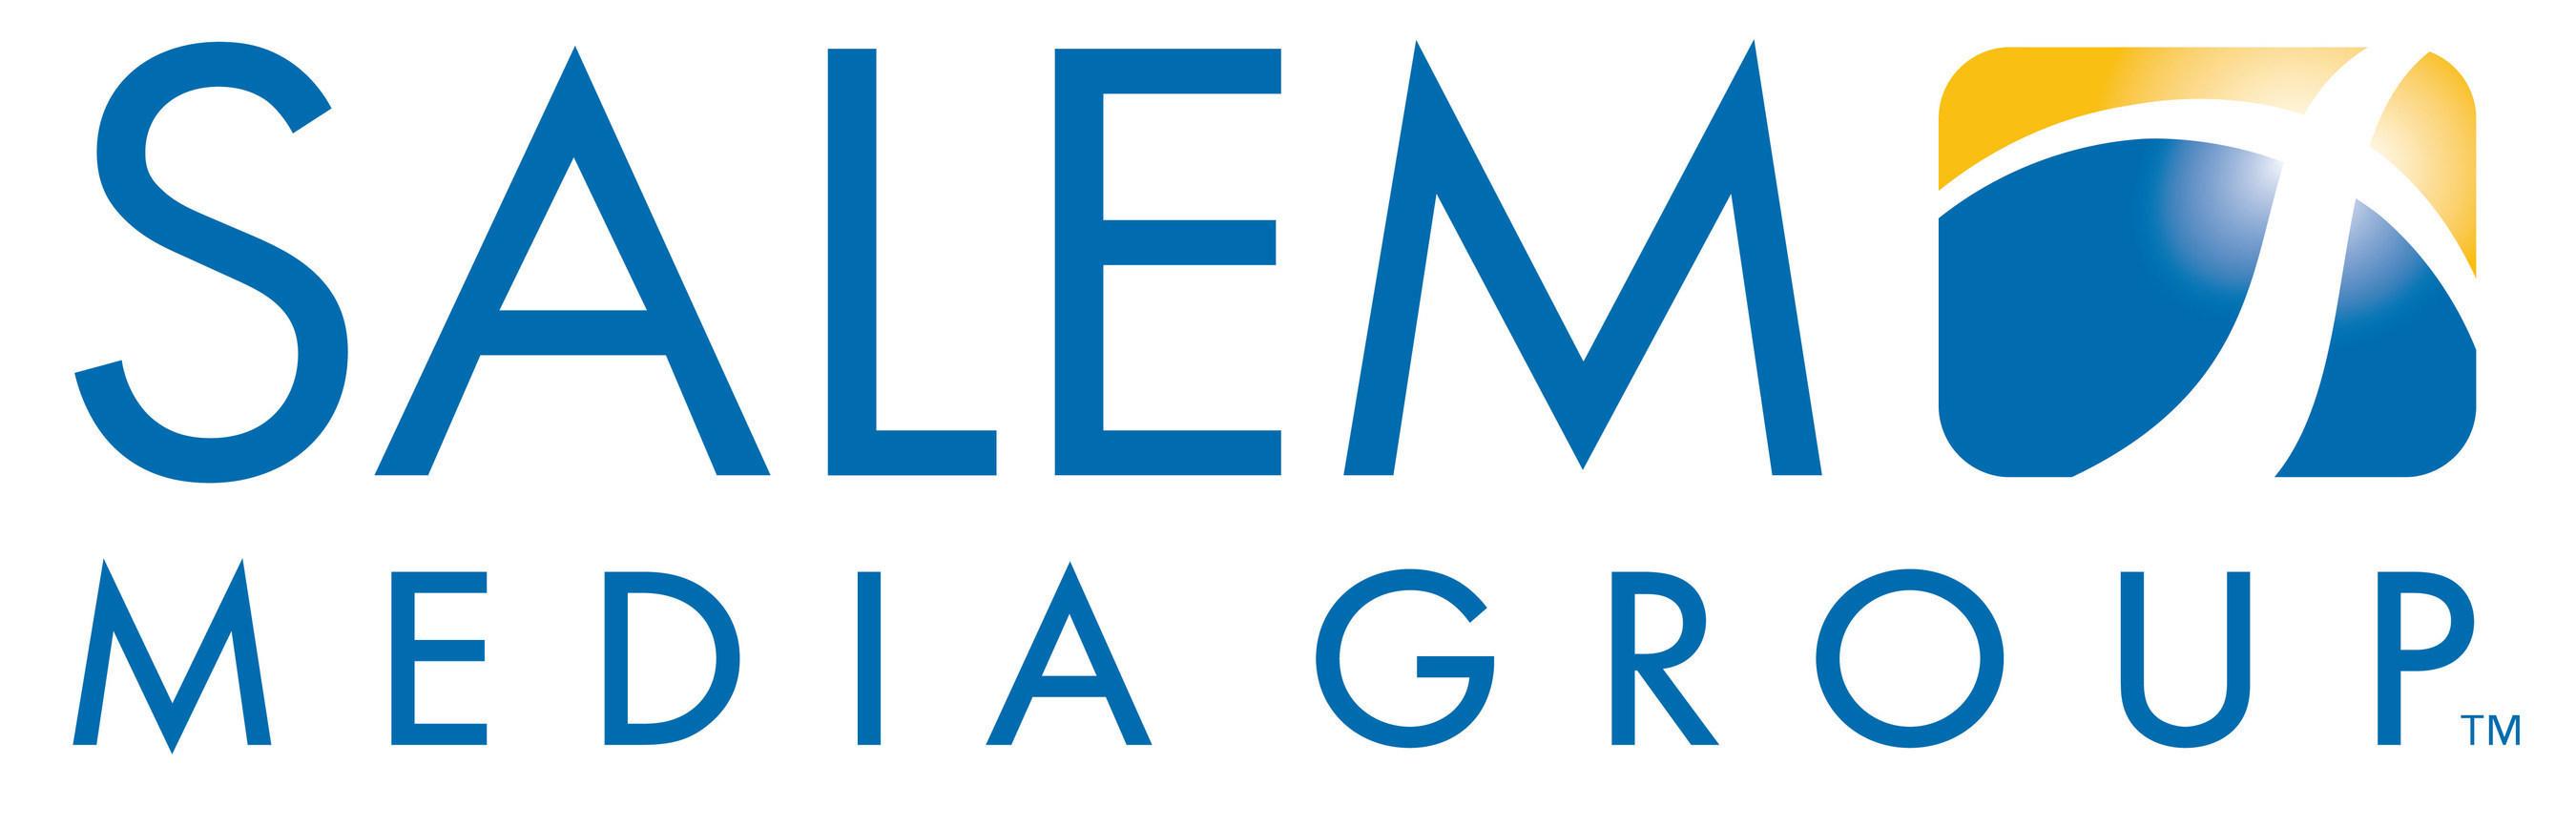 Salem Media Group, Inc. Announces Third Quarter 2016 Total Revenue Of $71.3 Million